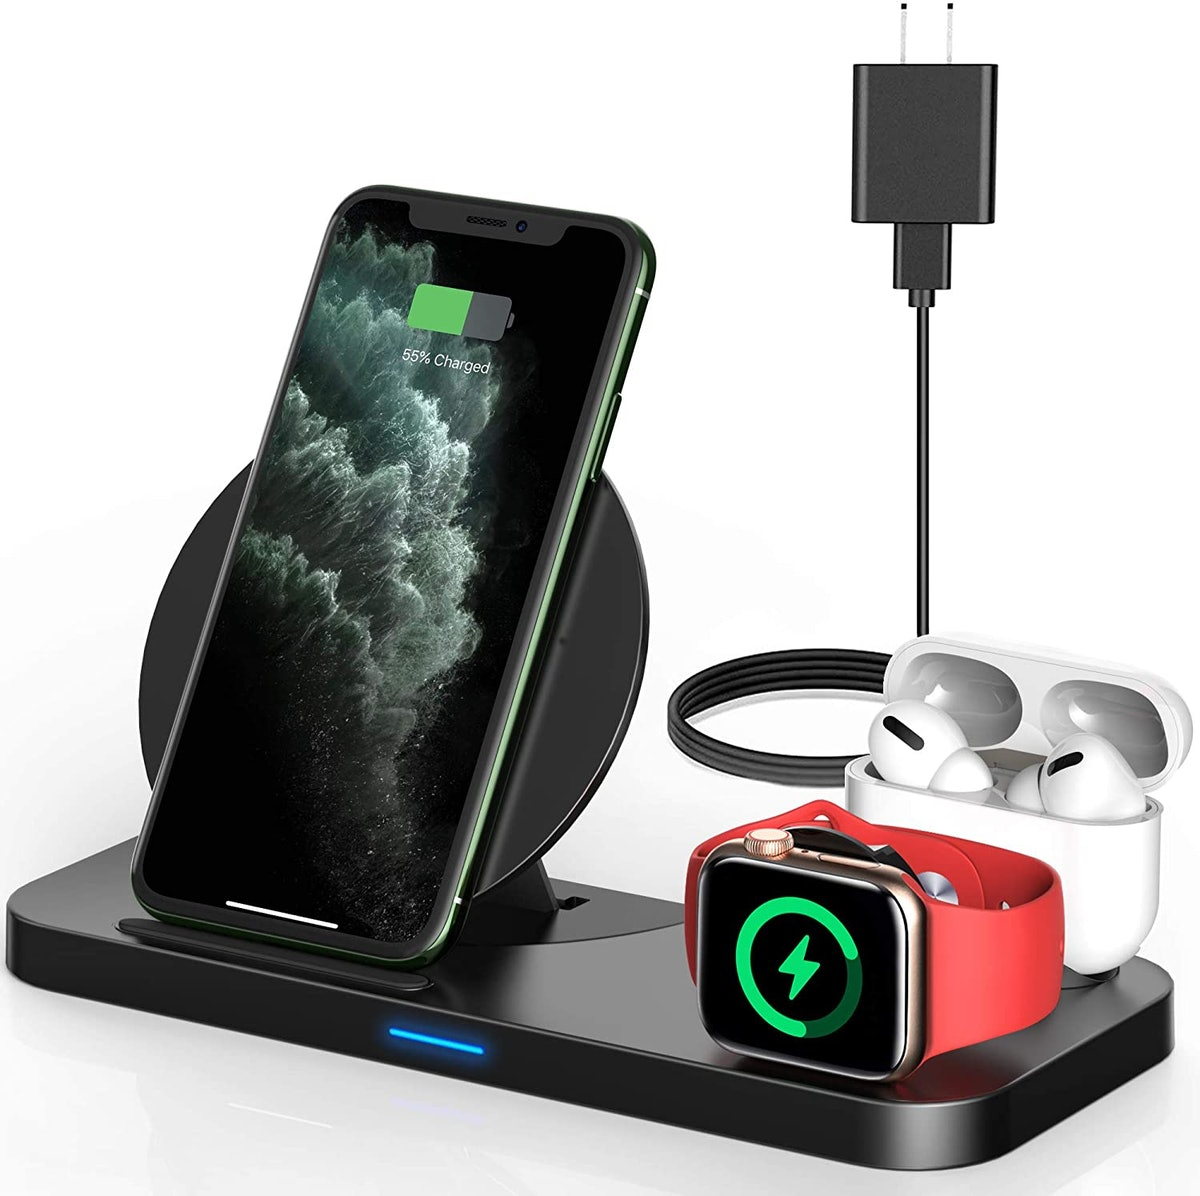 Powlaken Wireless Charger